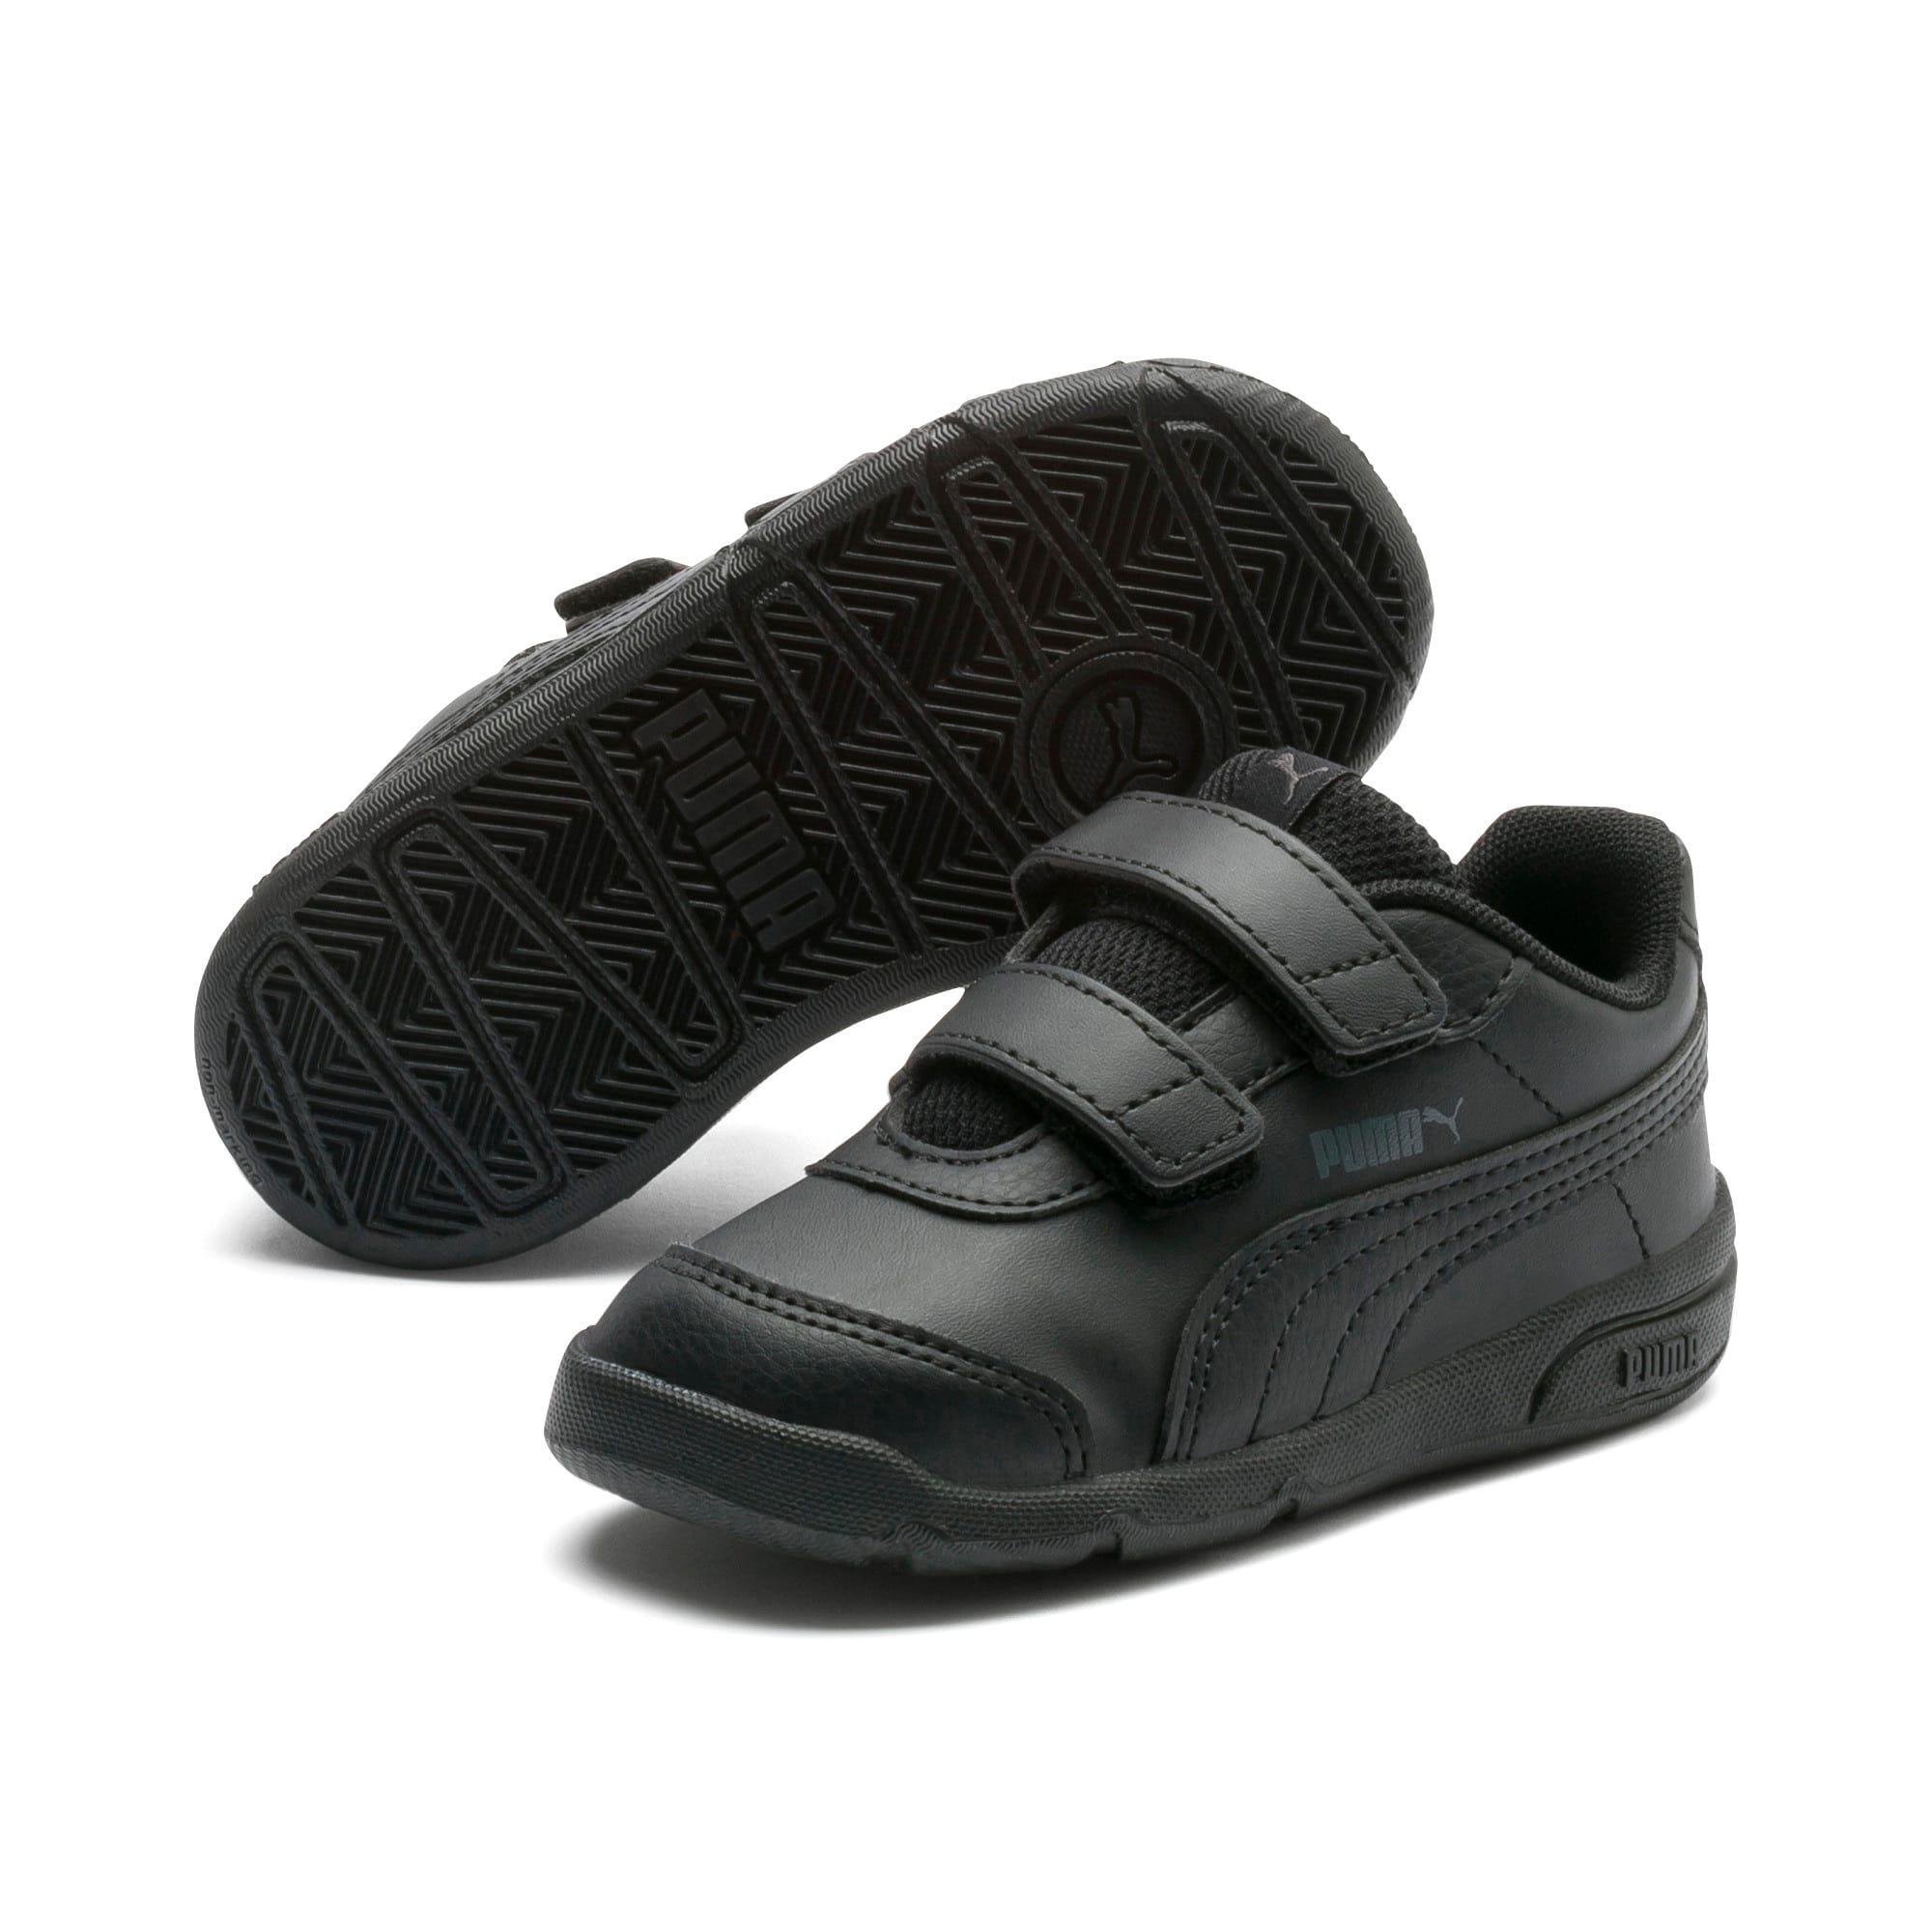 Thumbnail 2 of Basket Stepfleex 2 SL VE V pour bébé, Puma Black-Puma Black, medium